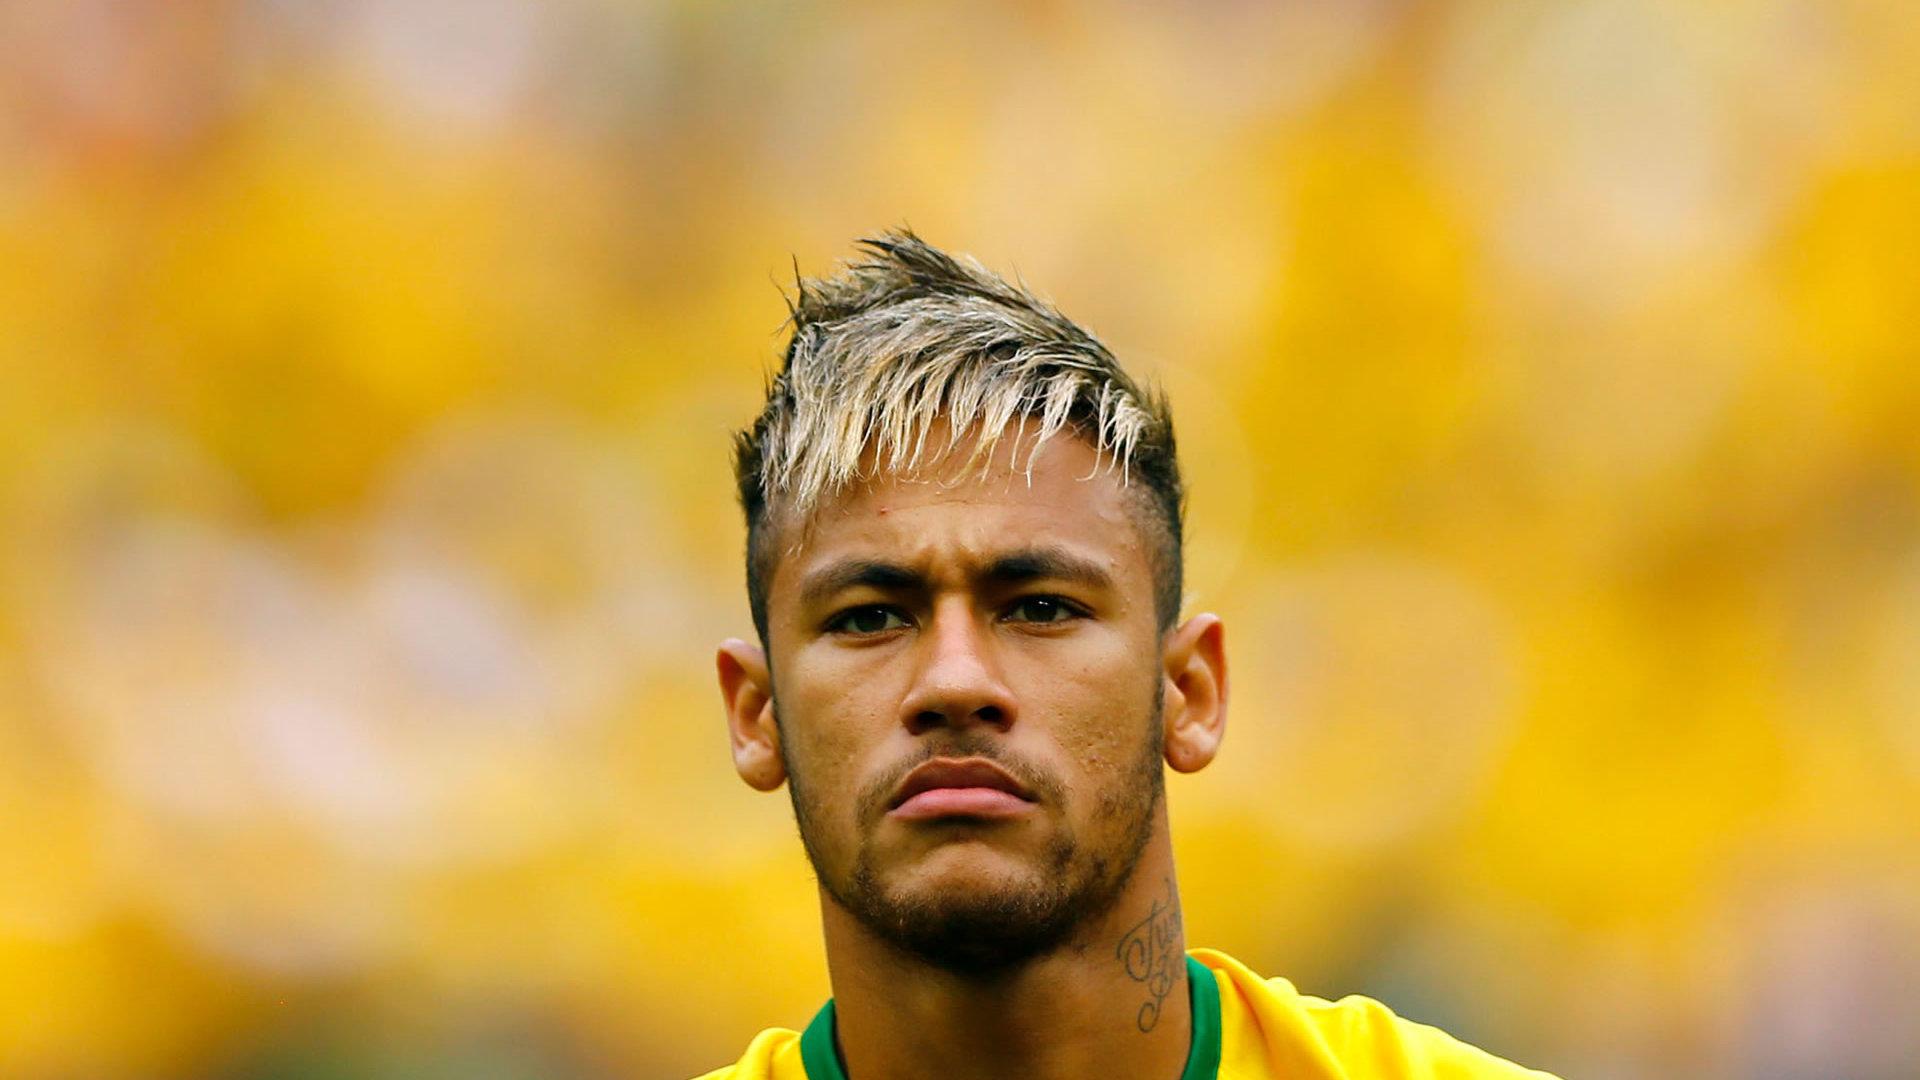 head Neymar Neymar - Wallpapers